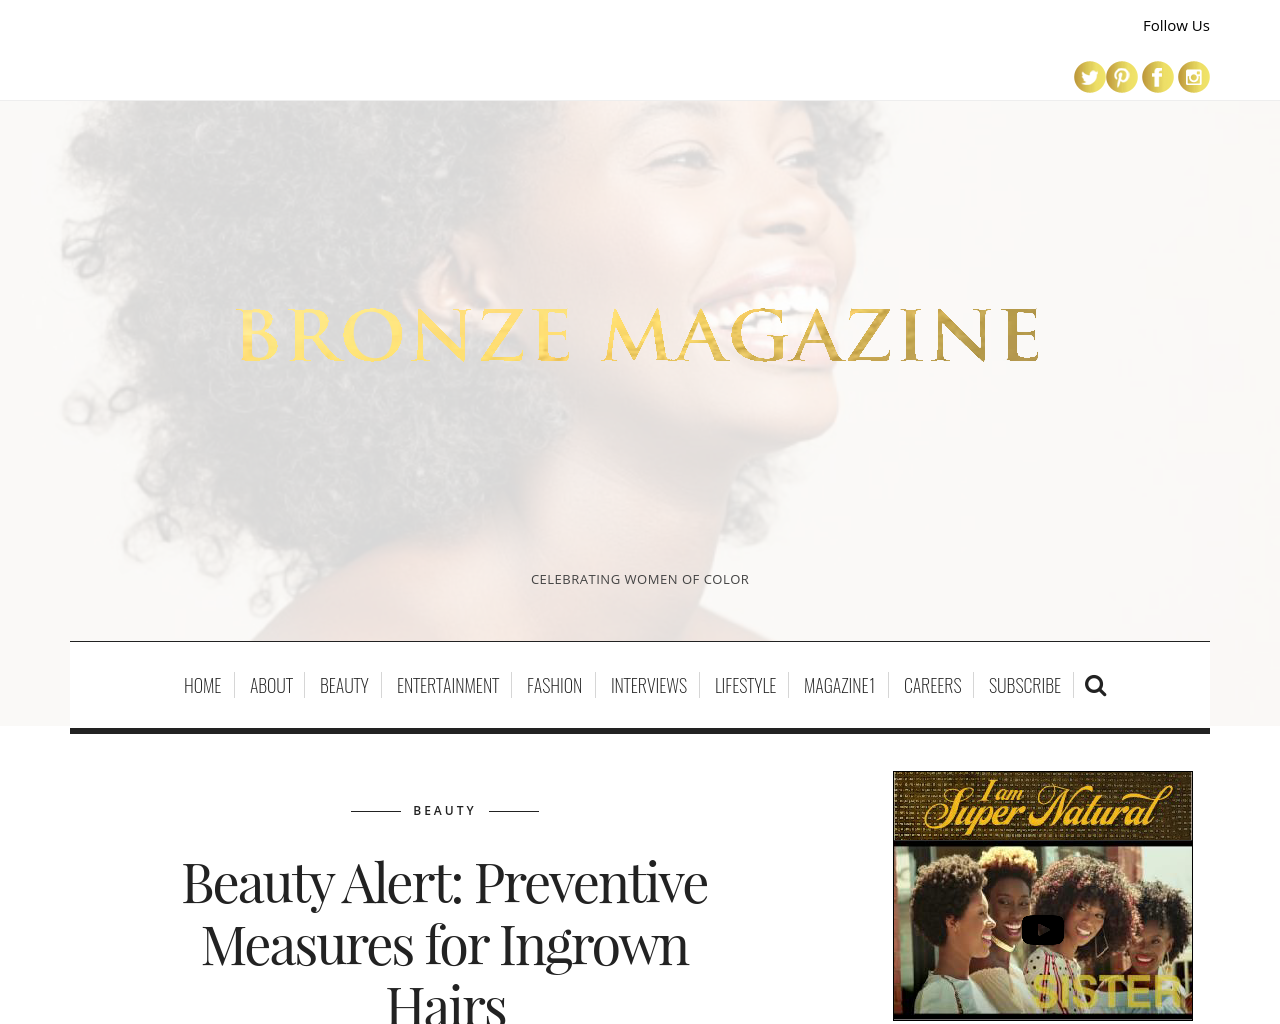 BRONZE-MAGAZINE-Advertising-Reviews-Pricing